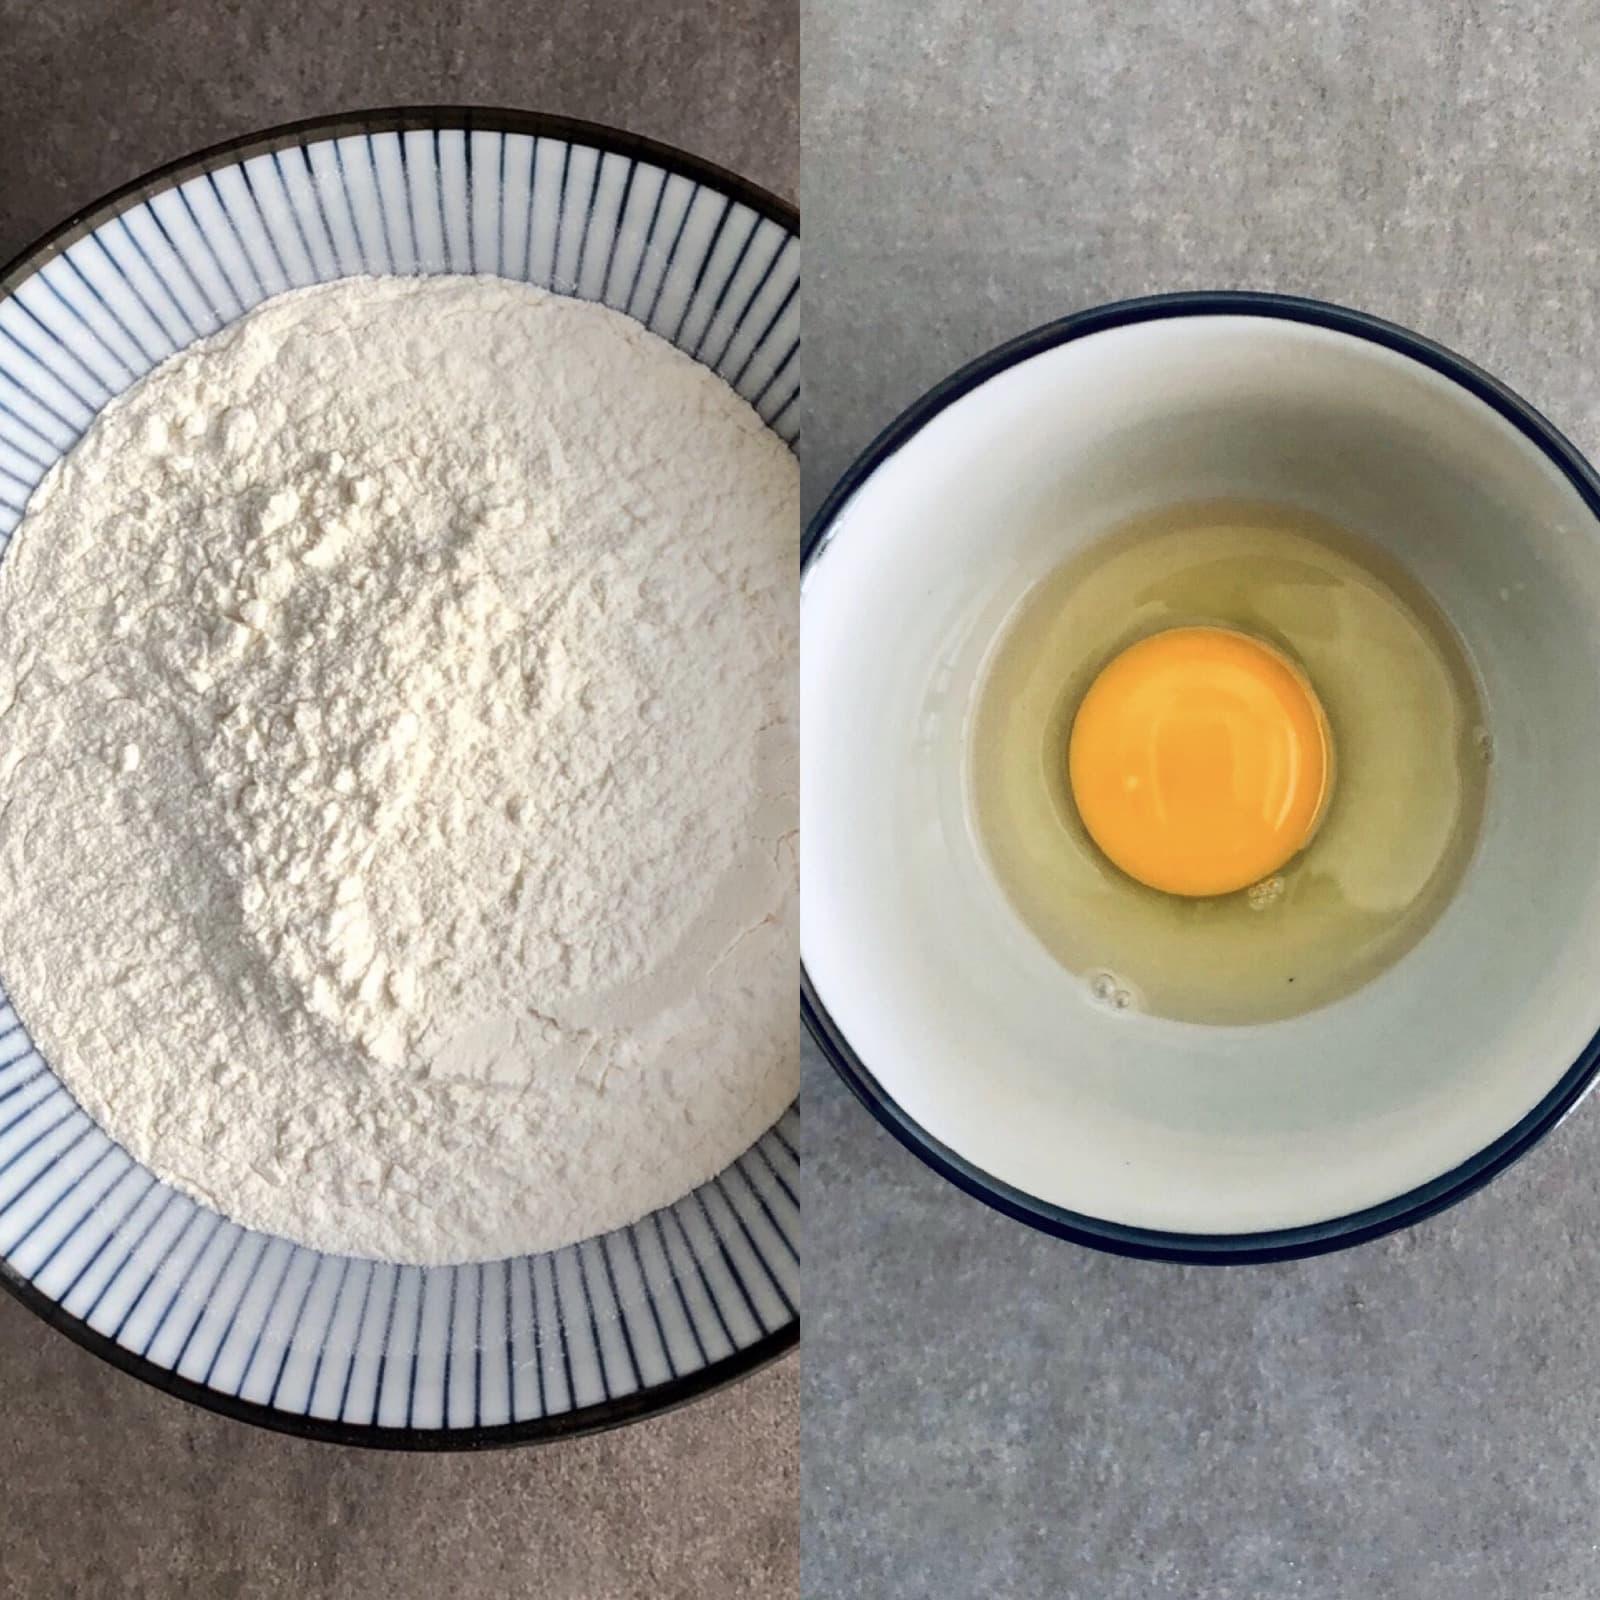 Tagliatelle Ingredients Handmade Ph. FedeCortezzi